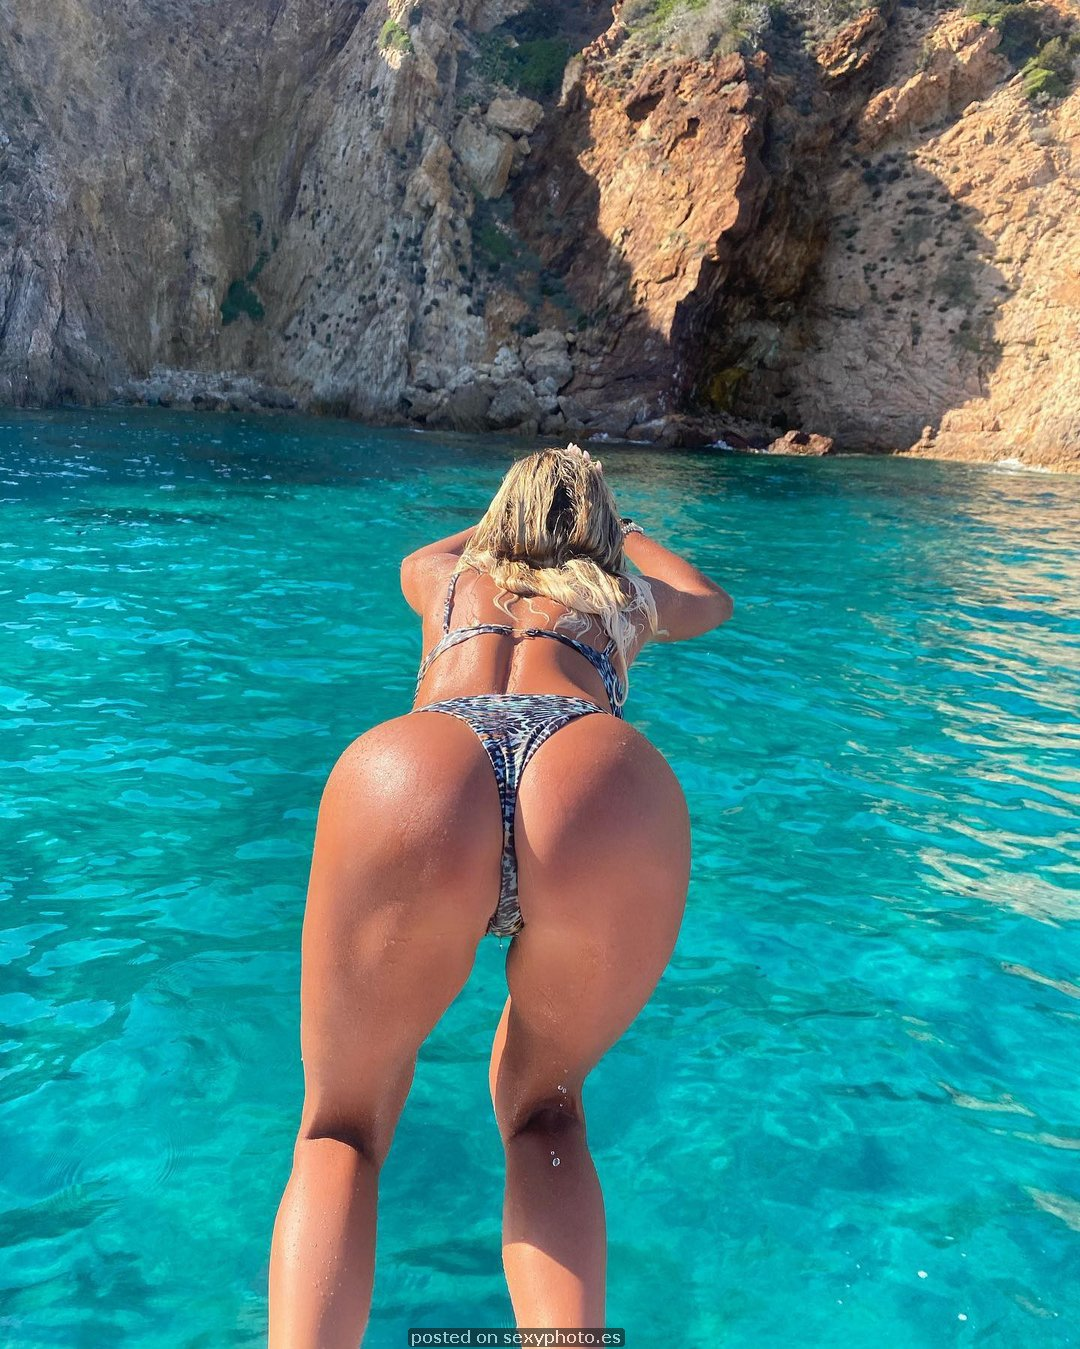 go to water ass bikini